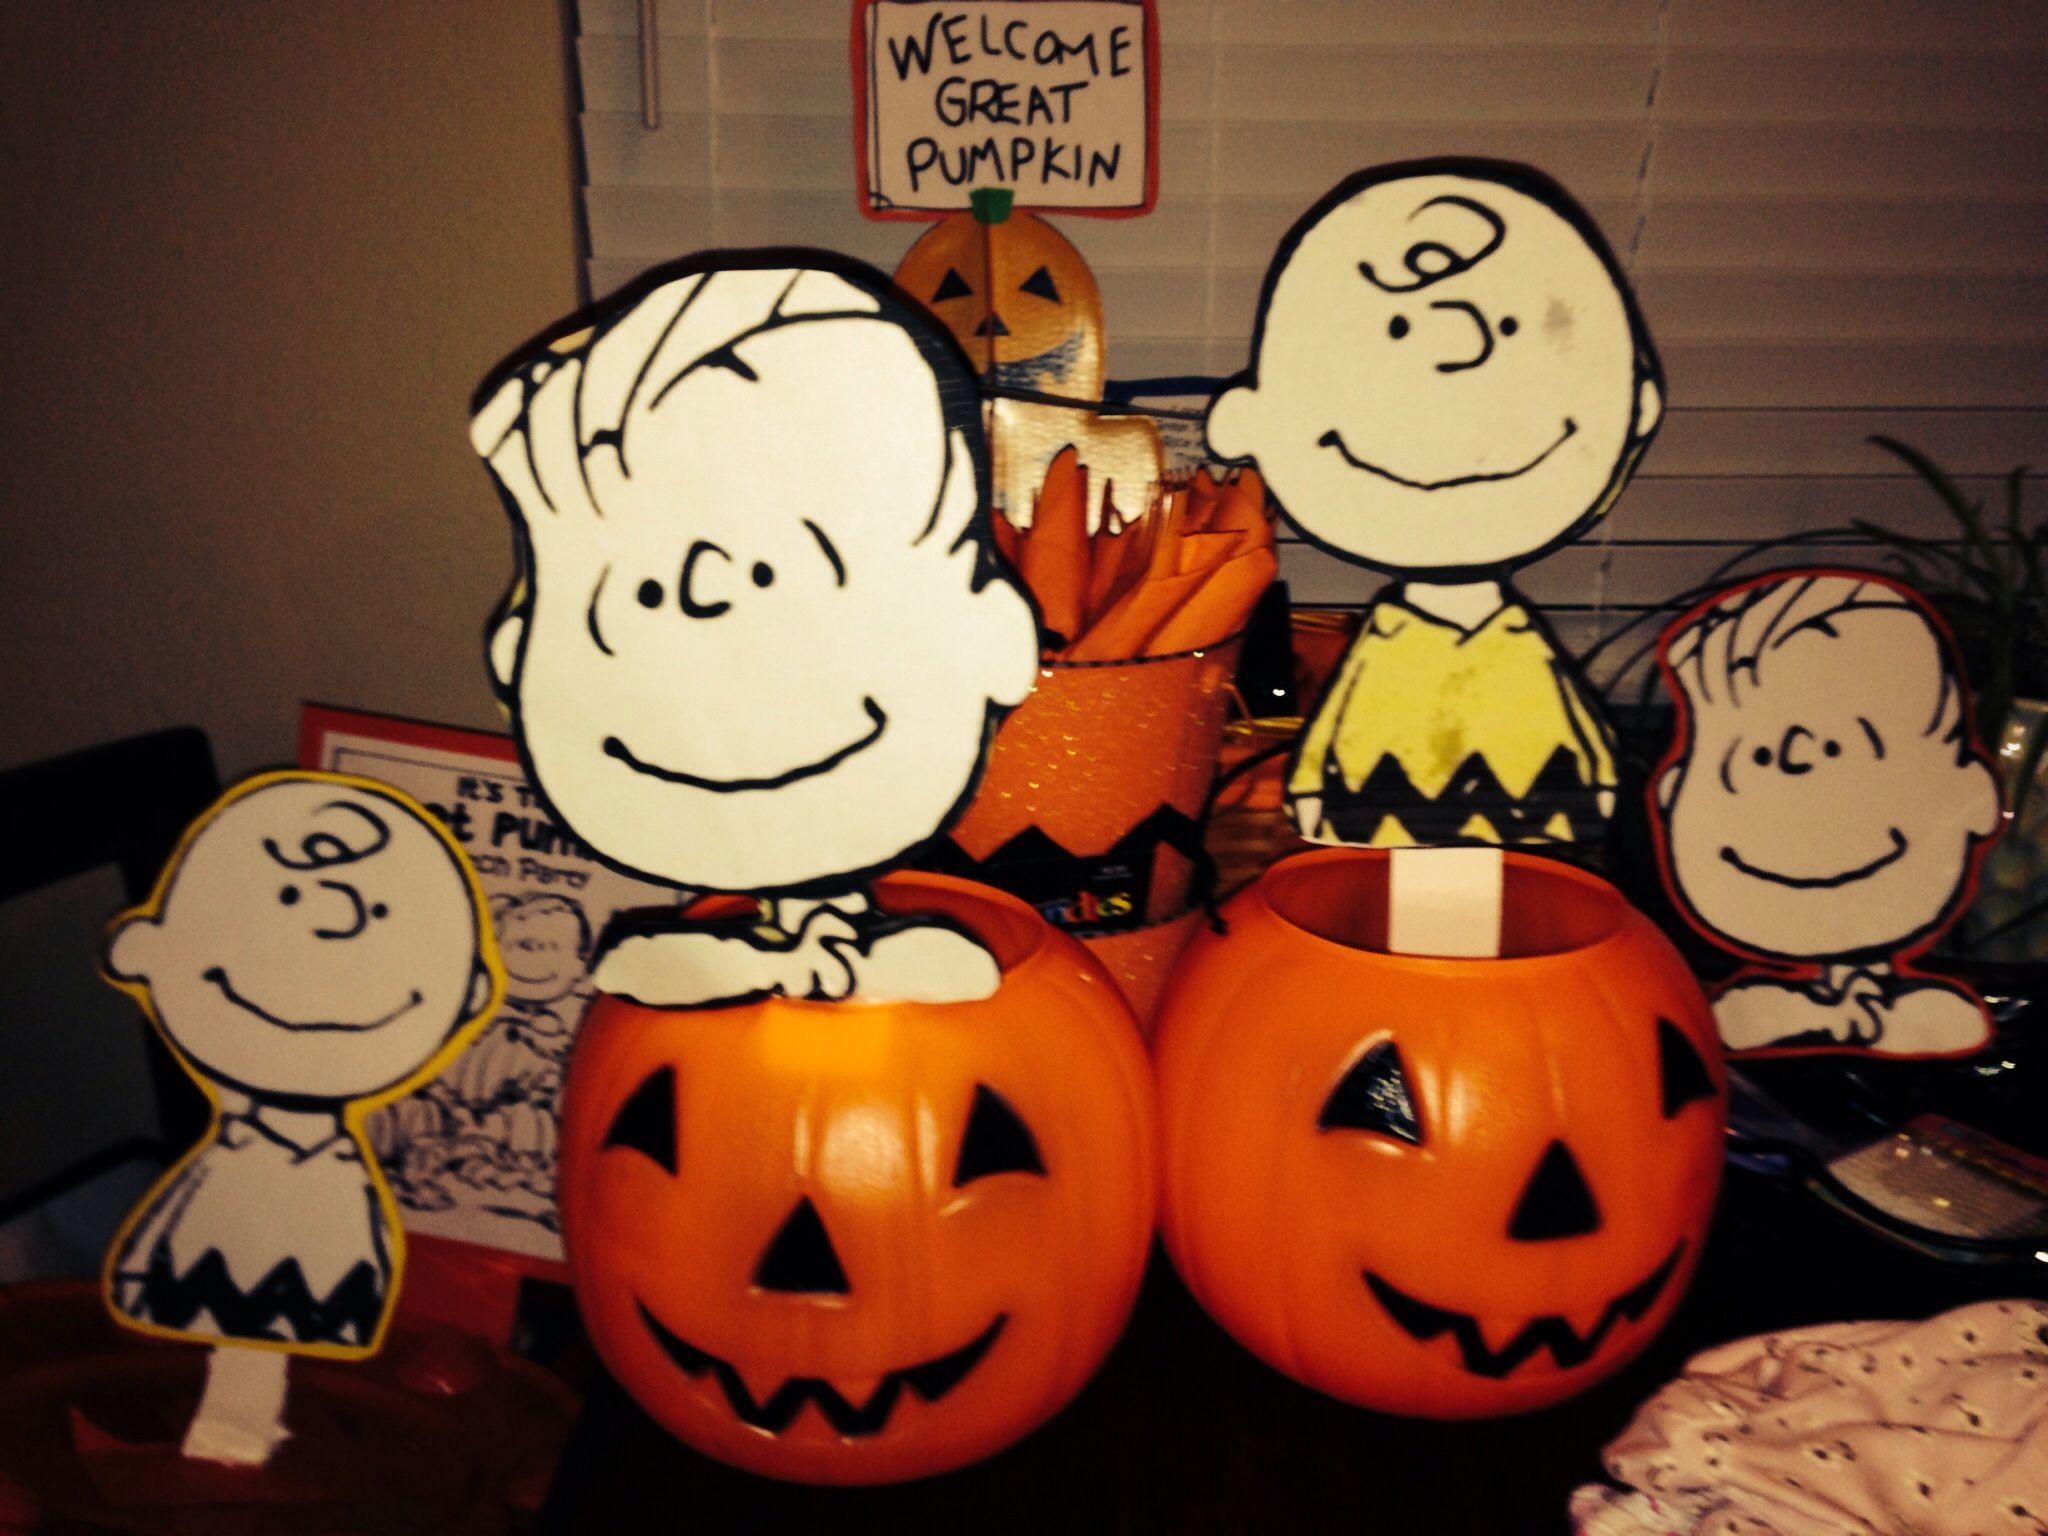 Great Pumpkin Charlie Brown Party